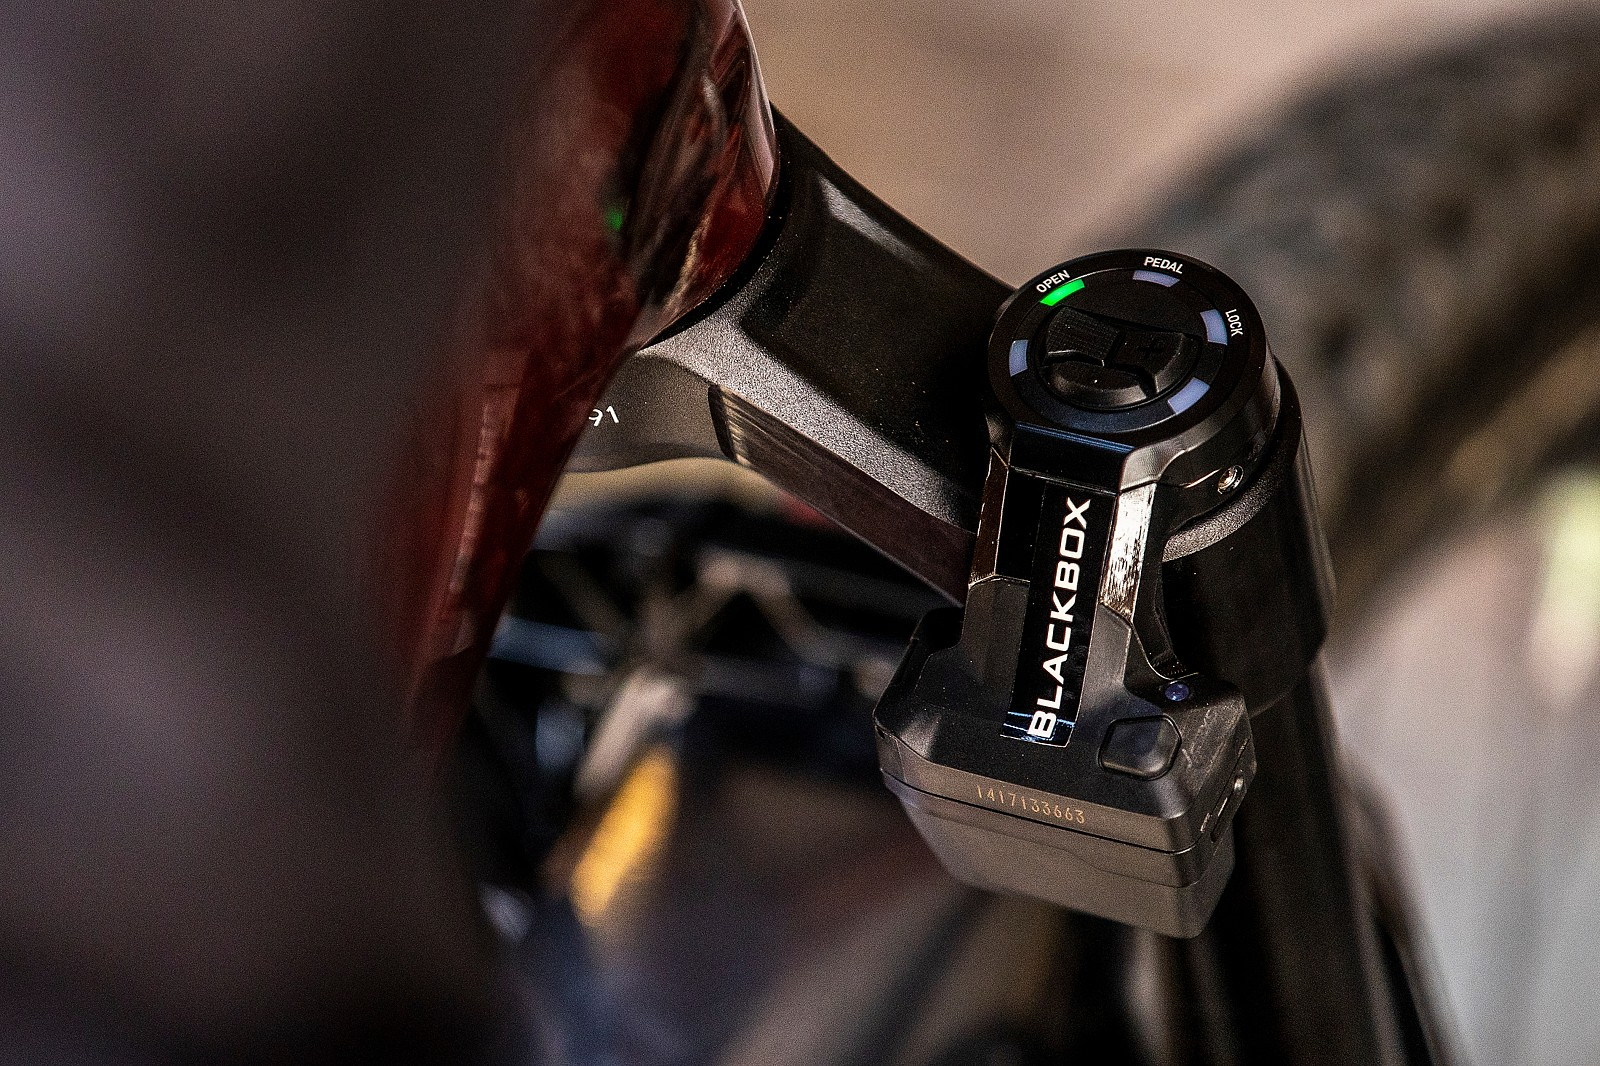 BlackBox Mystery Time Machine? - PIT BITS - 2021 WORLD CHAMPS - Mountain Biking Pictures - Vital MTB